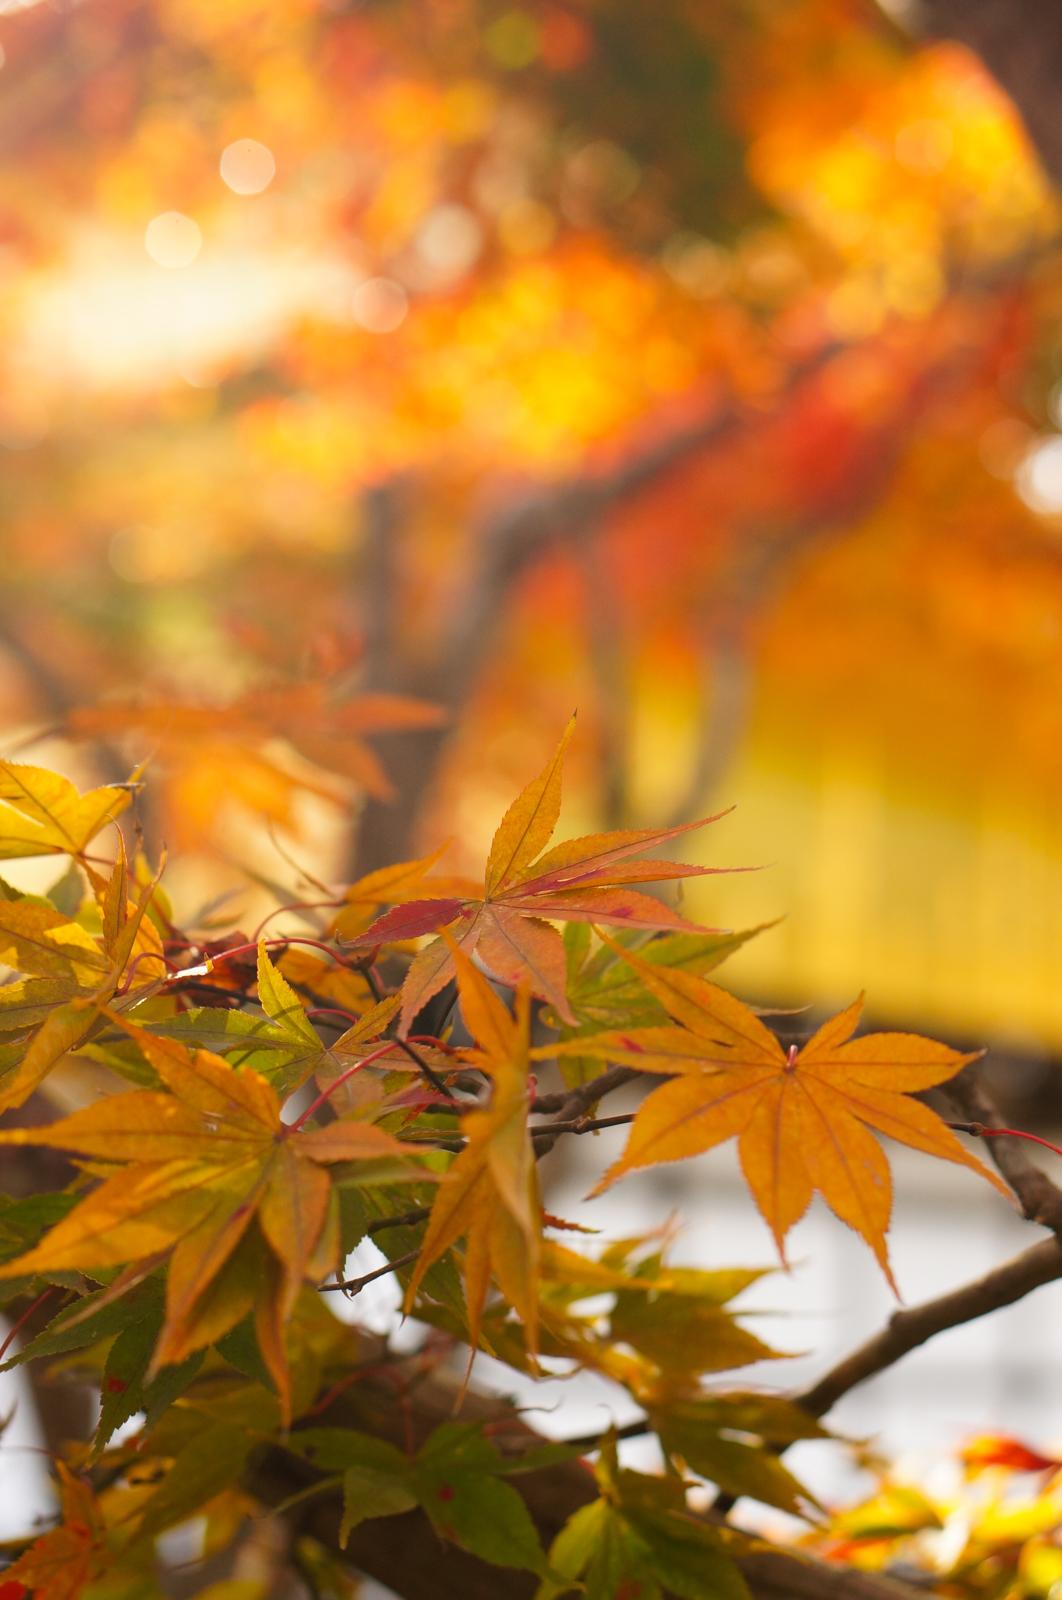 Kyoto, momiji kyoto, voyage kyoto, séjour kyoto, kyoto automne, kyoto fall, kyoto autumn, kyoto érables, kinkaku-ji, temple du pavillon d'or